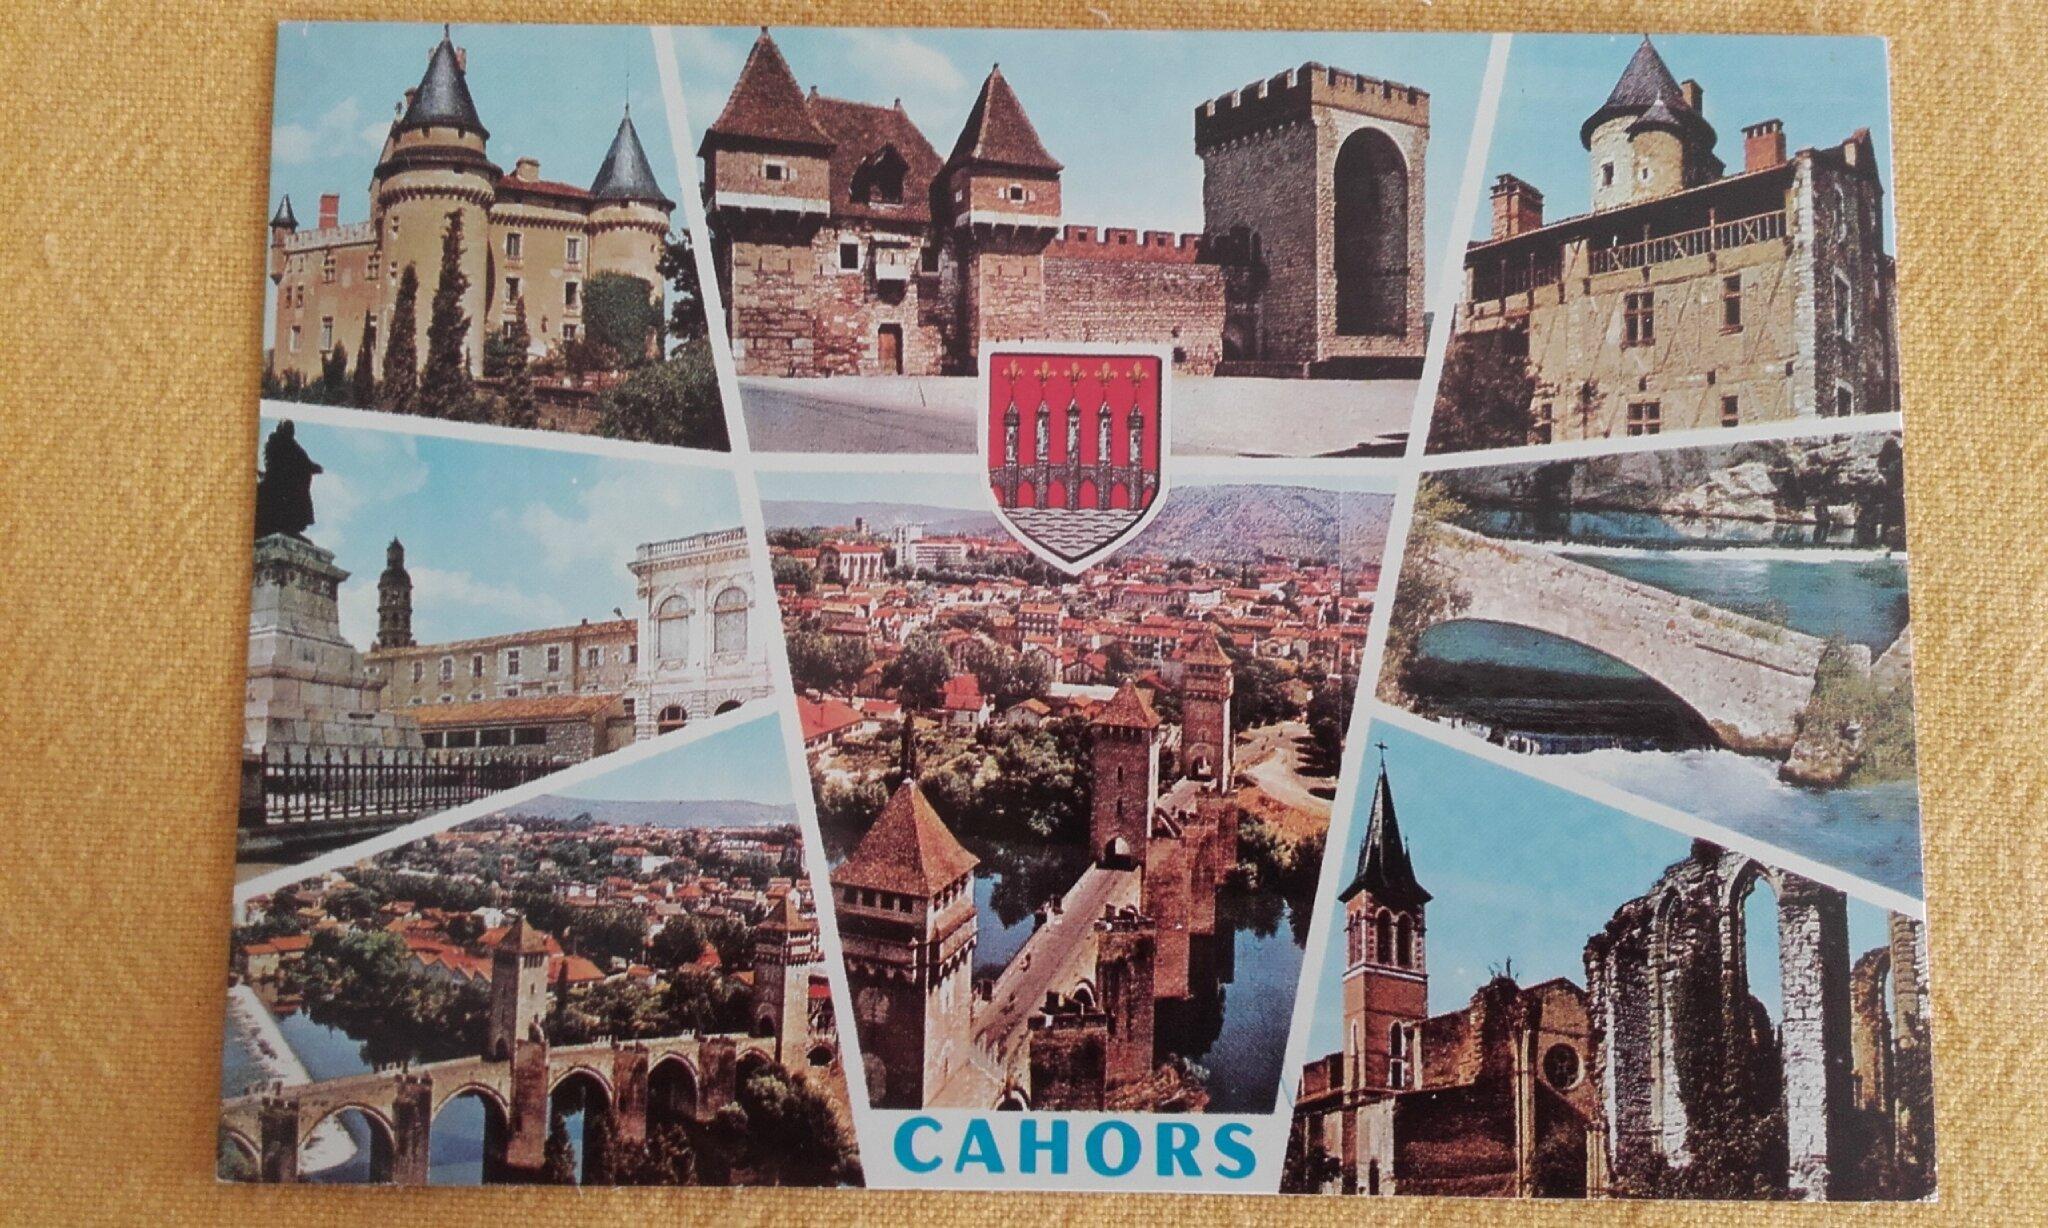 Cahors datée 1982